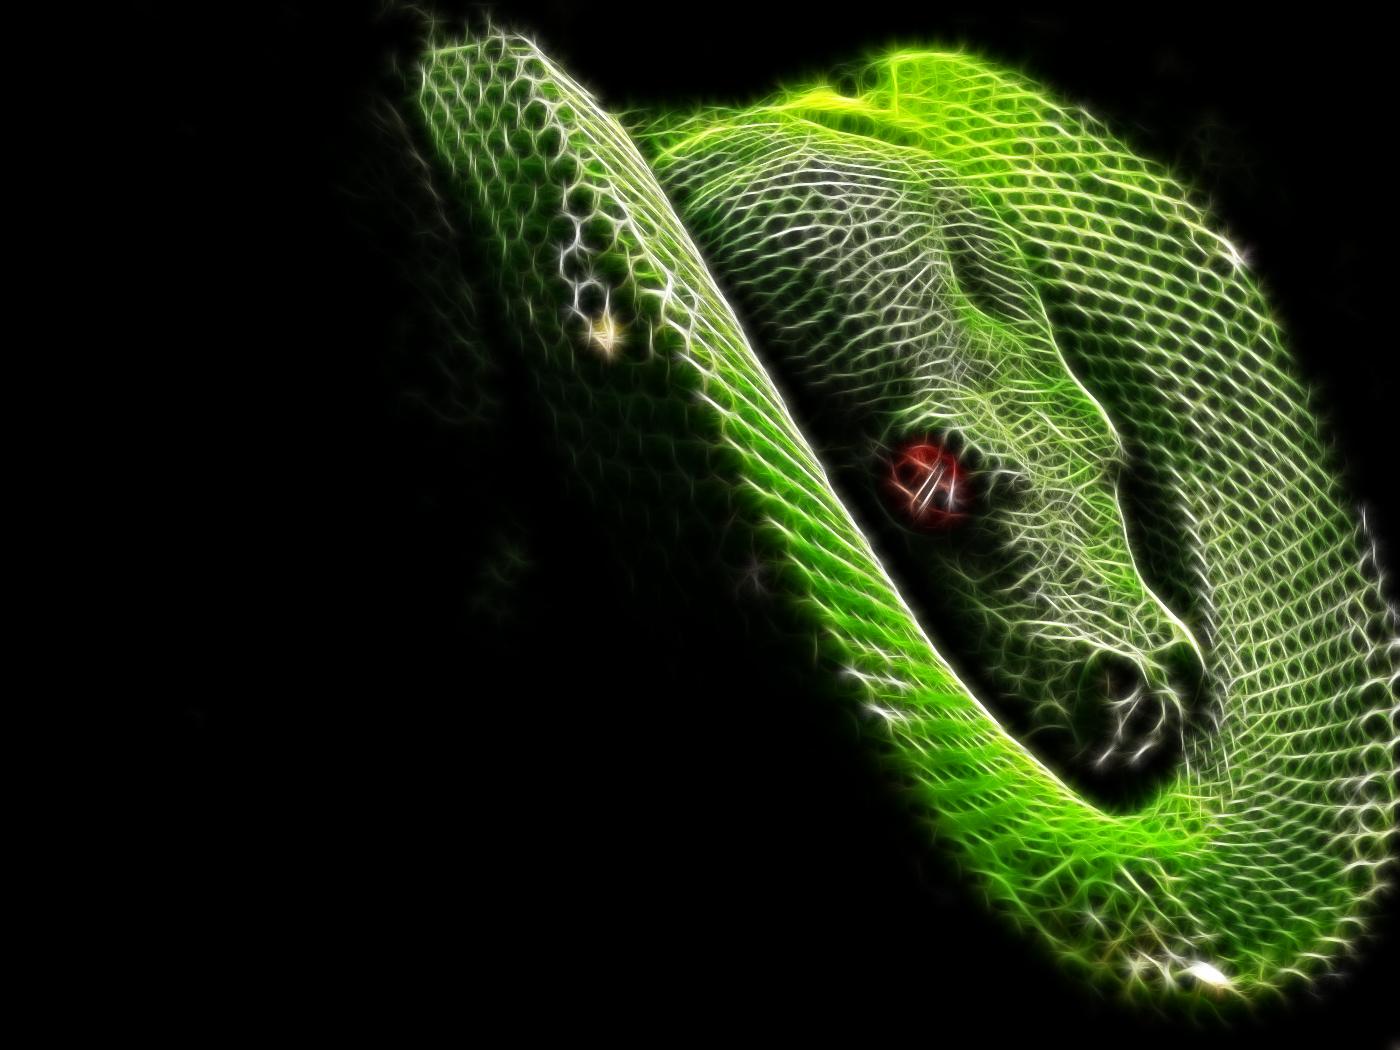 horrible snake background